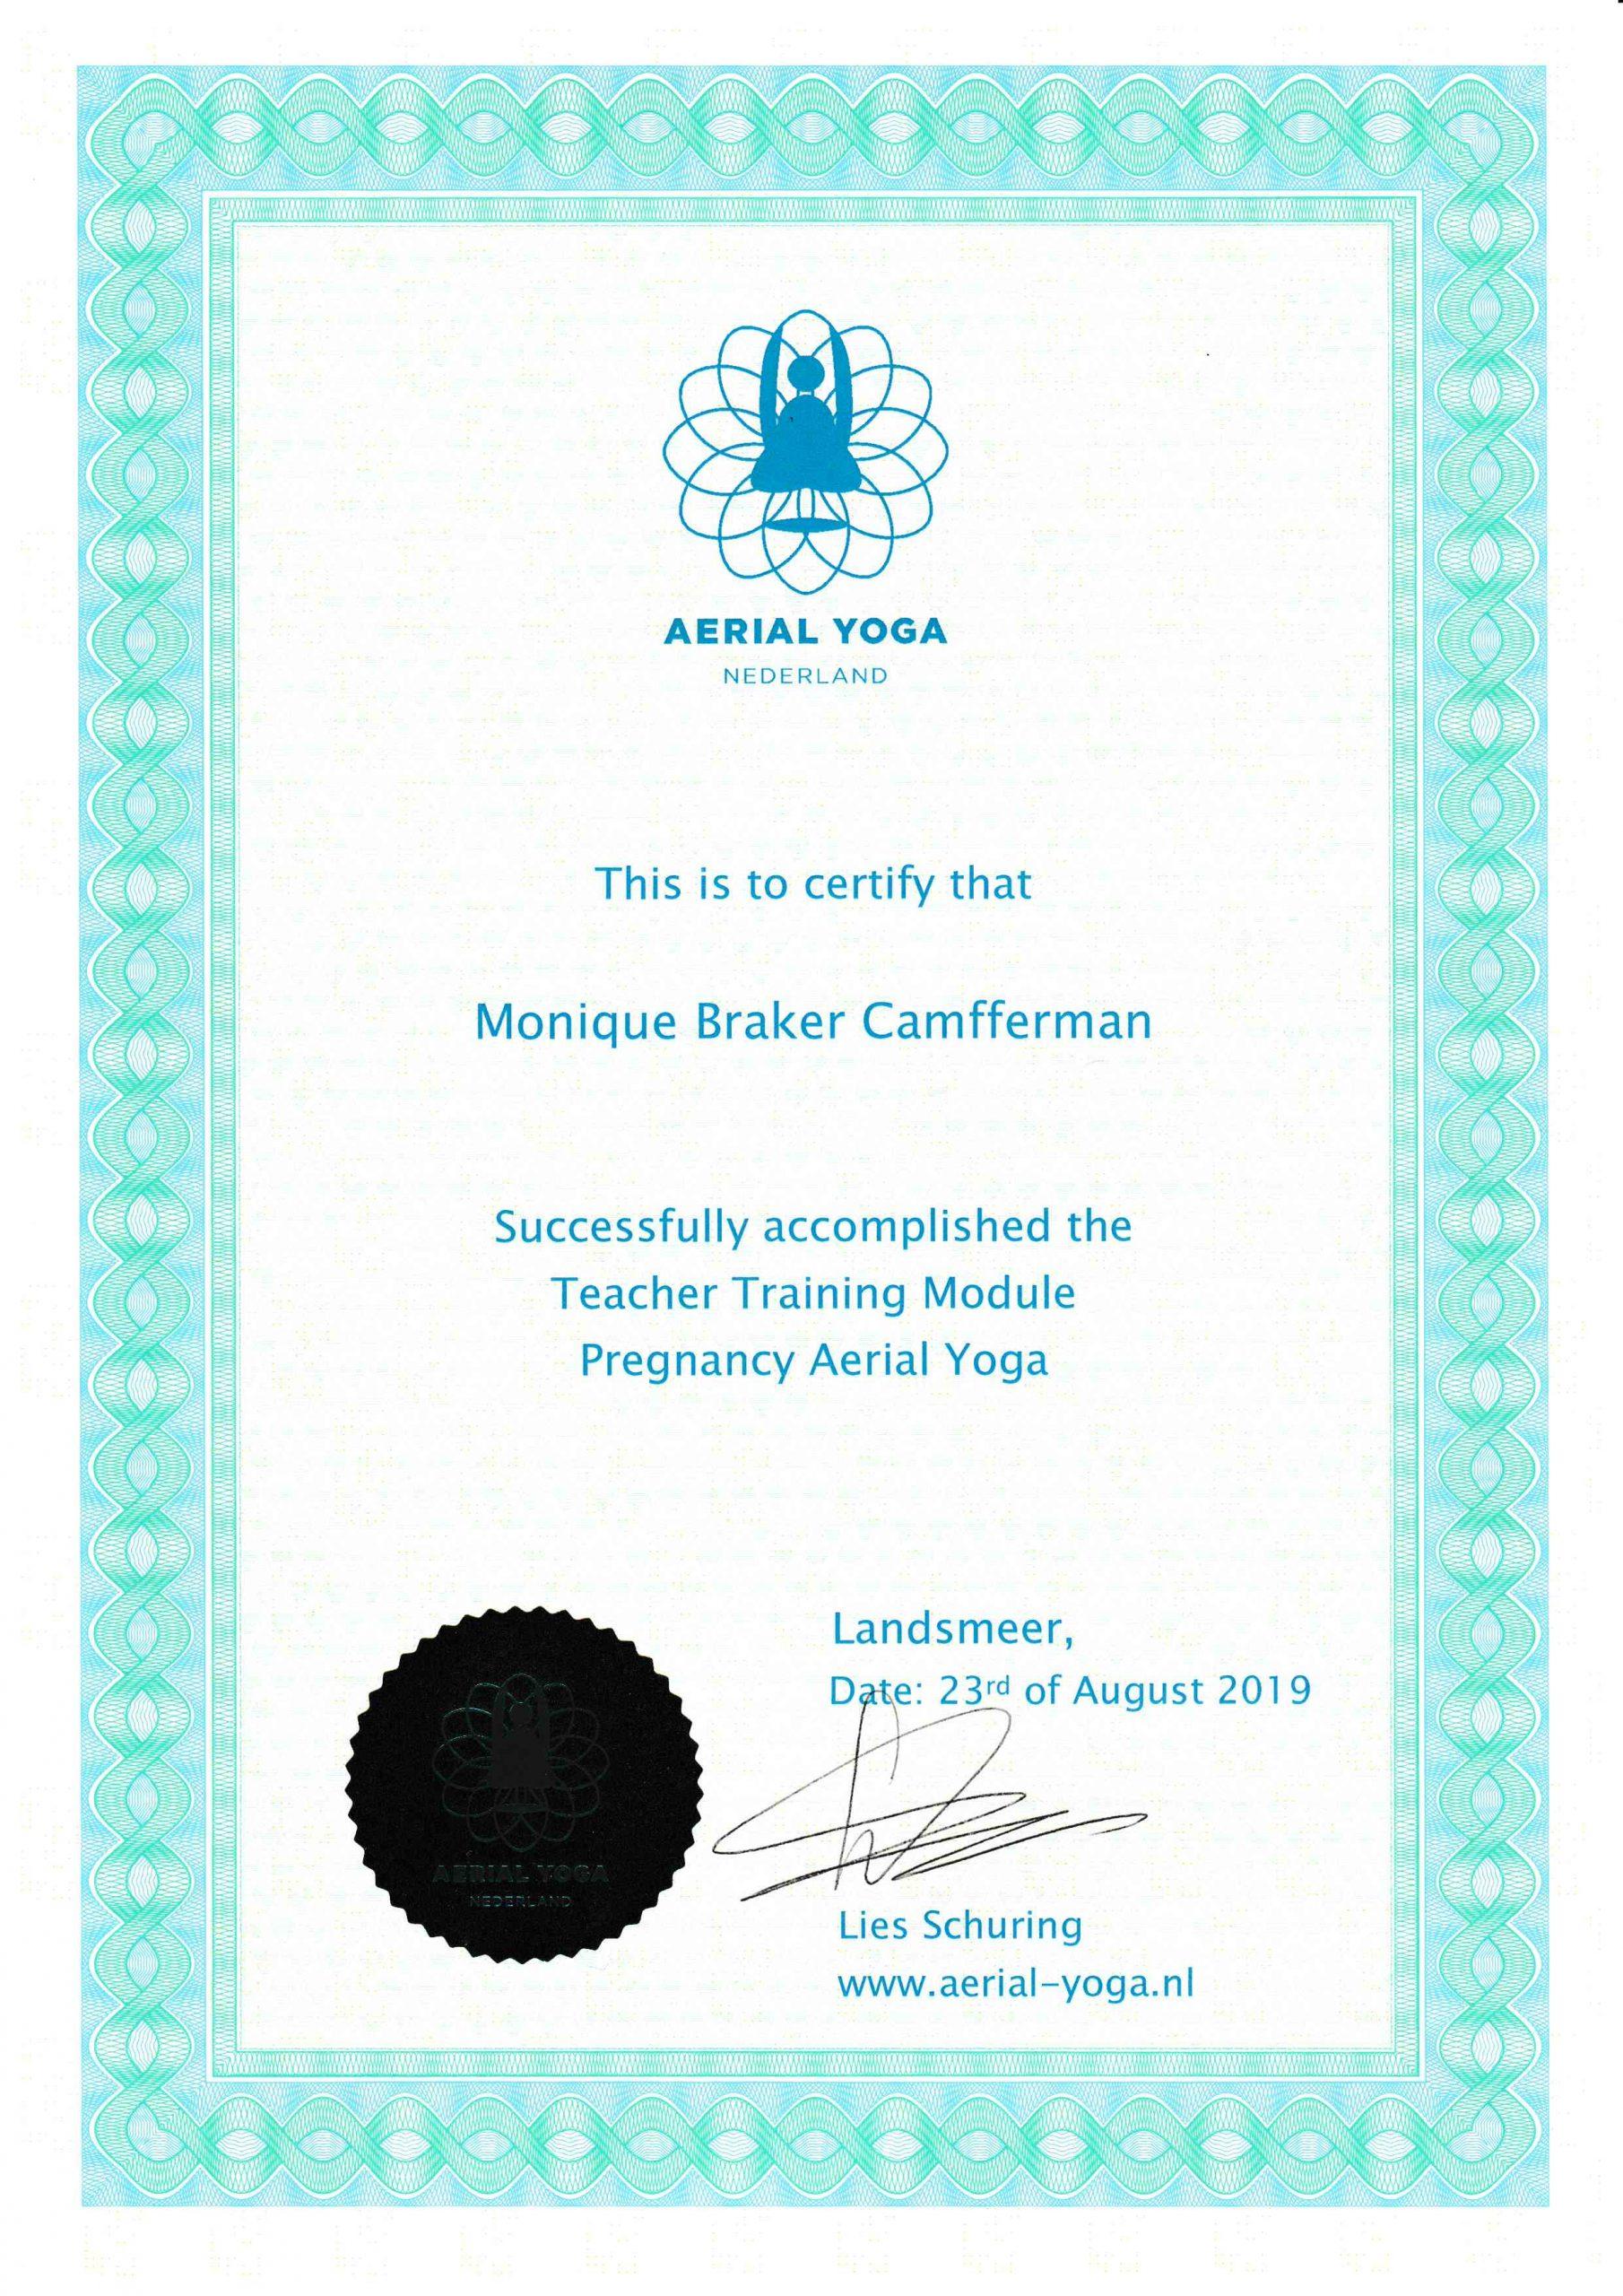 Aerial Yoga Pragnancy